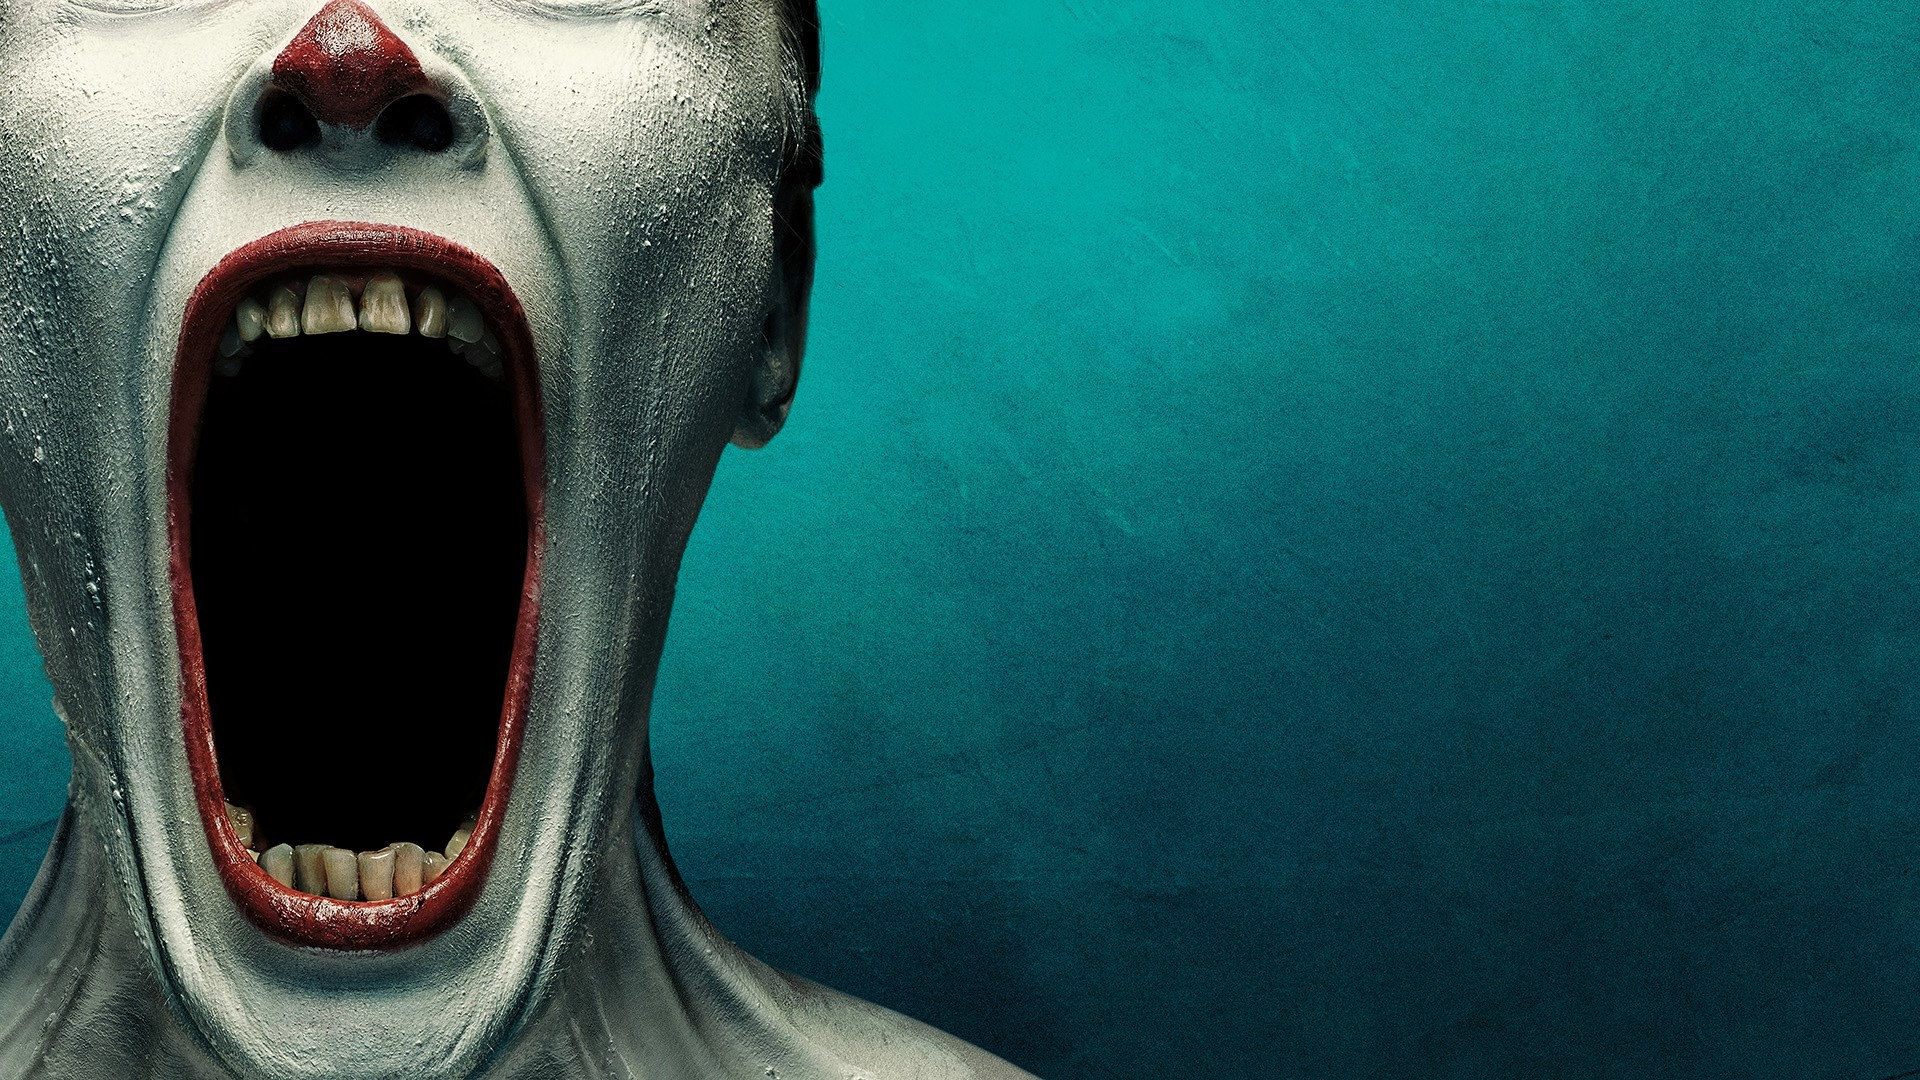 American horror story hotel wallpaper 78 images - Ahs wallpaper ...